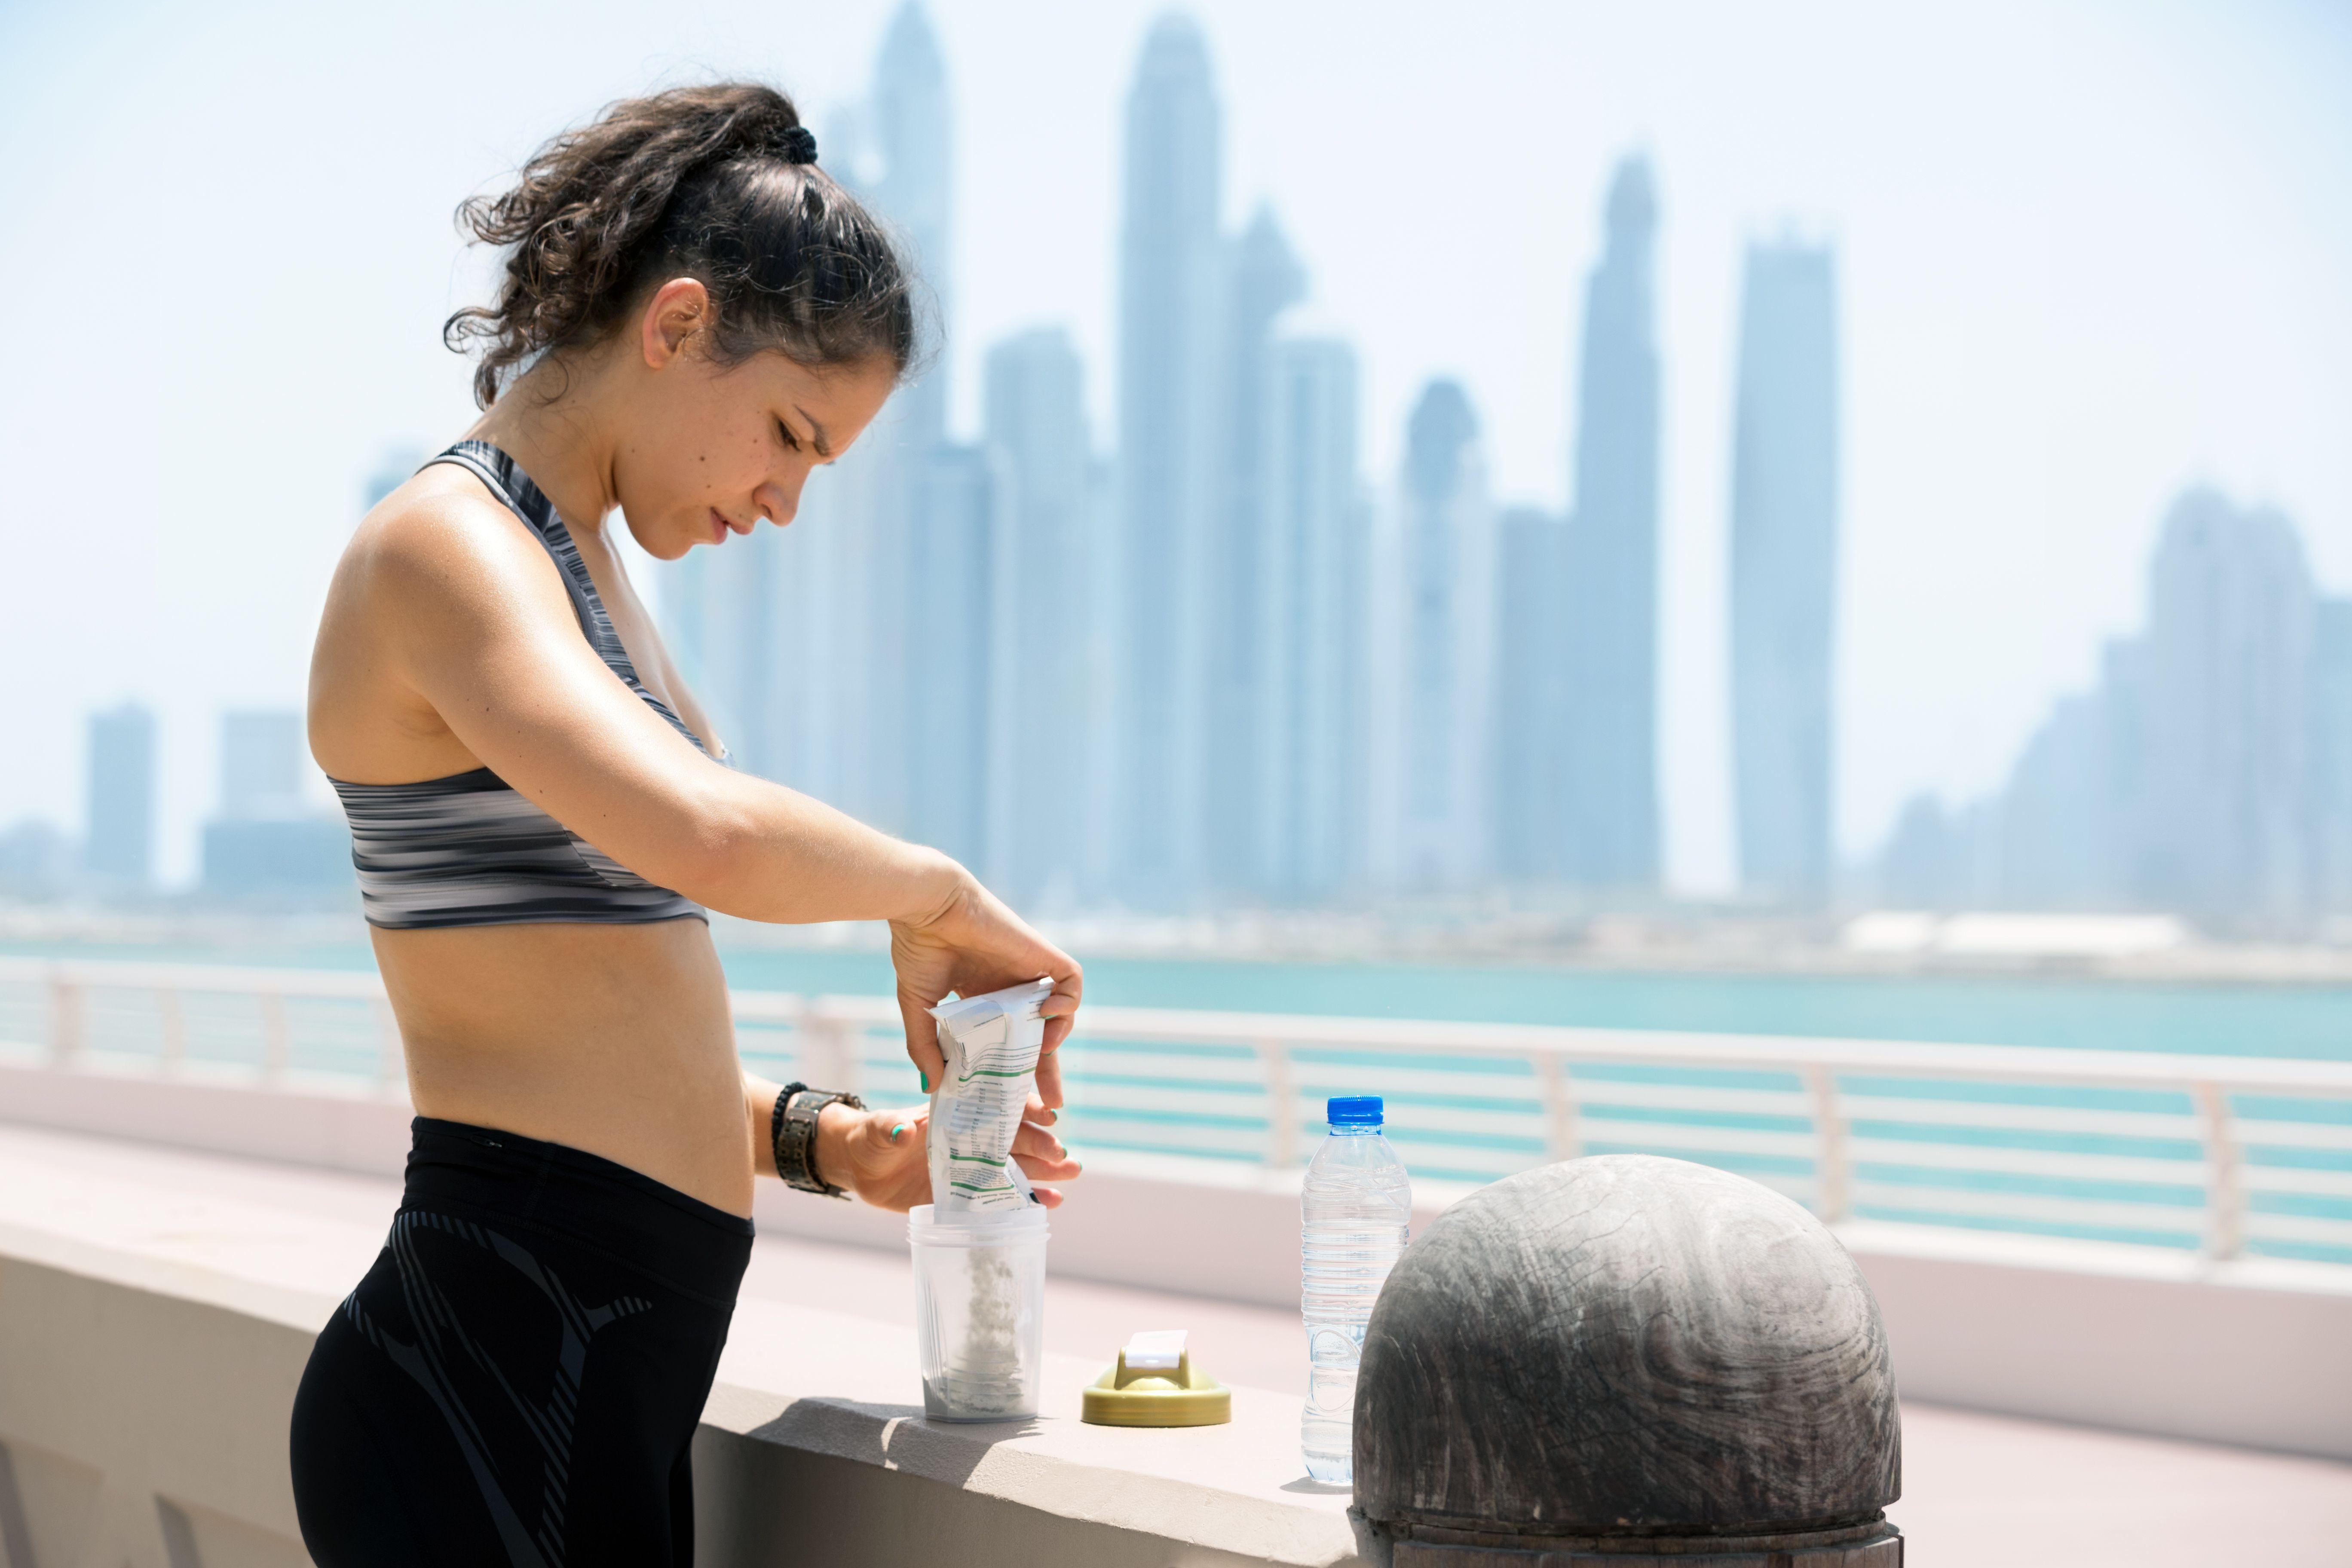 Female runner preparing refreshment